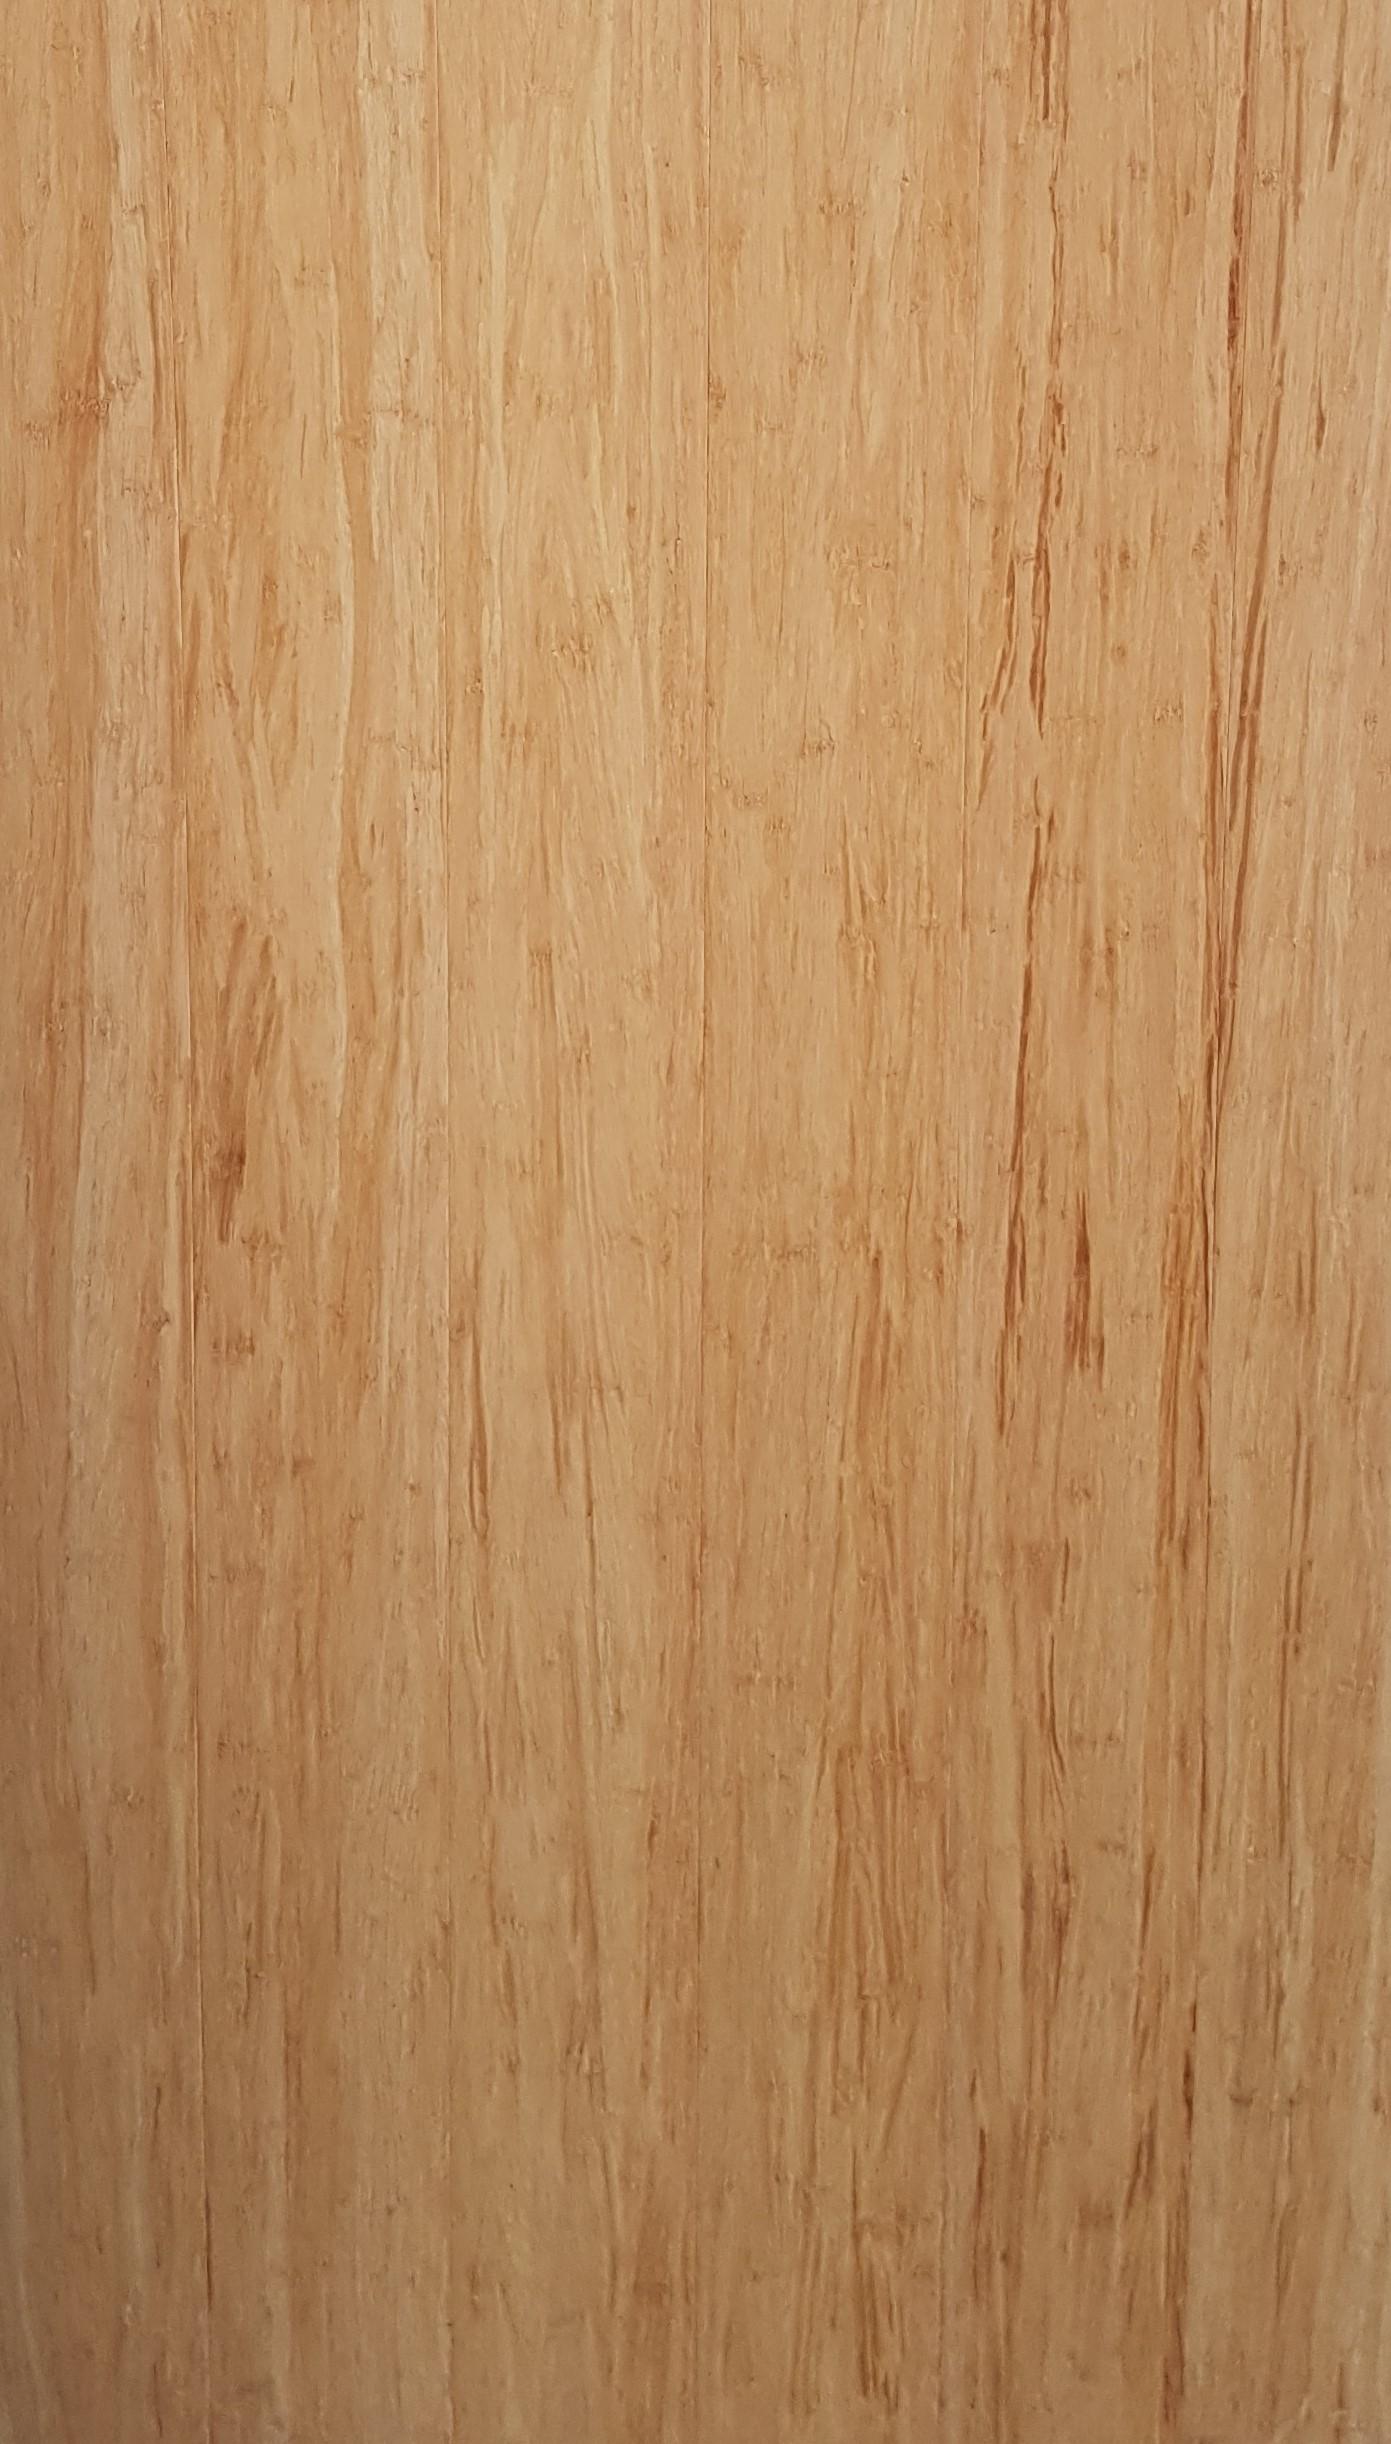 Natural Bamboo Flooring 1830mm x 135mm x 14mm 15m2 Per